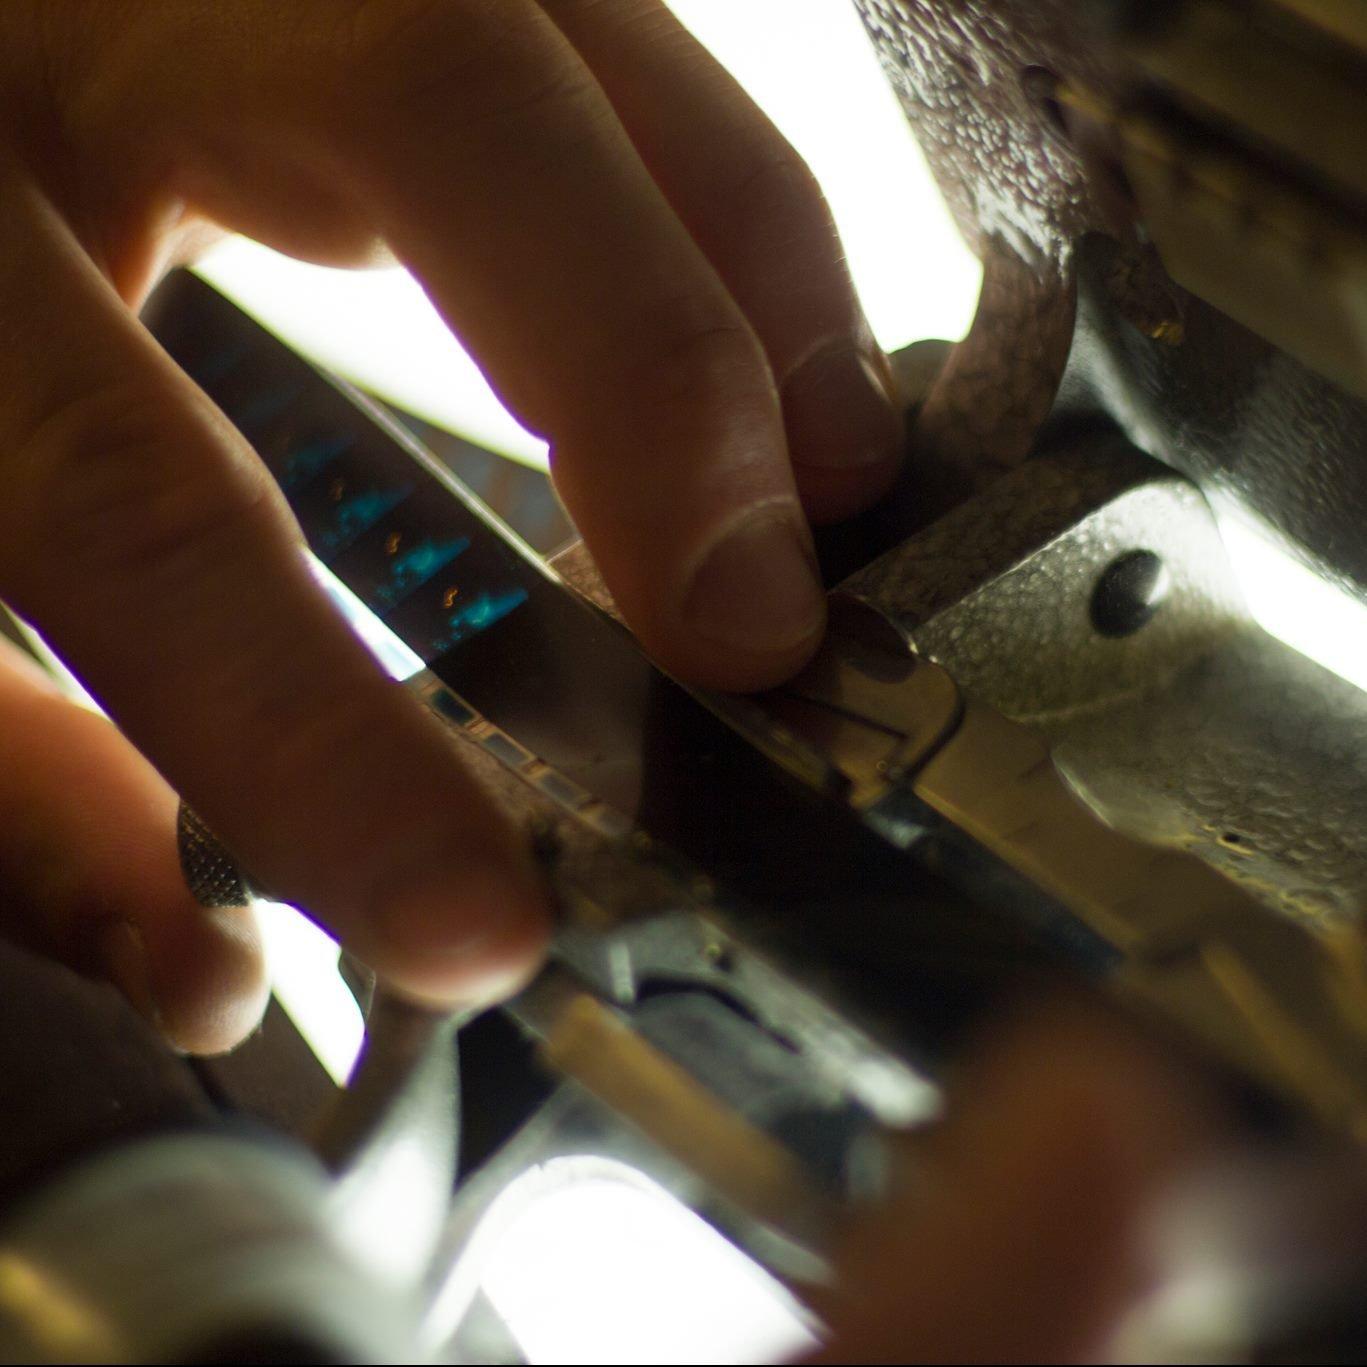 AgX Film Collective, Editing 16mm Film, Waltham Open Studios 2020